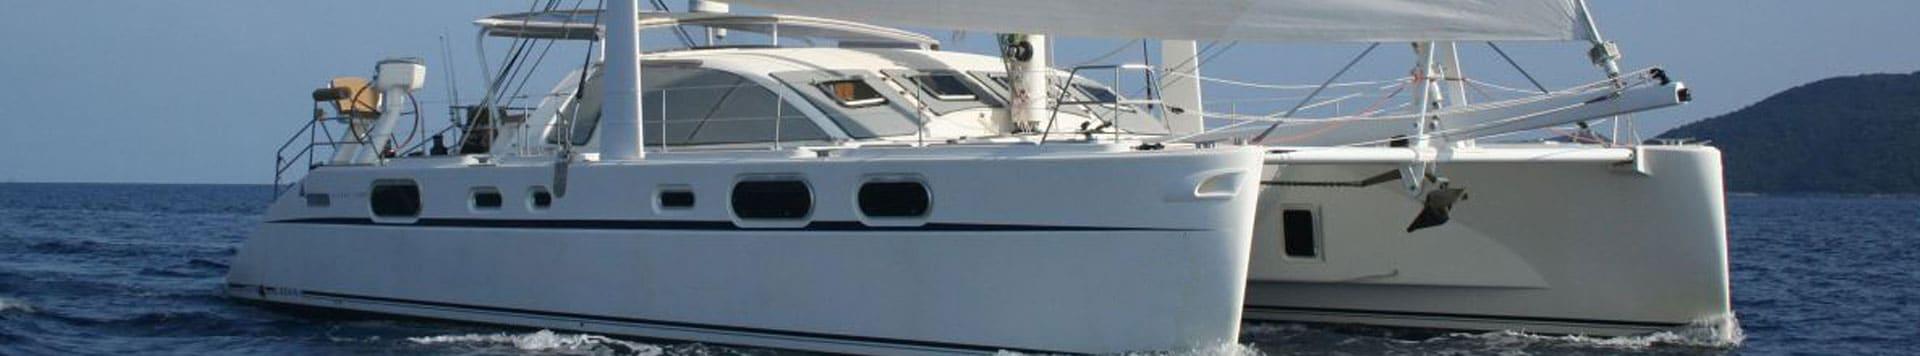 vacanza in catamarano - catana 58